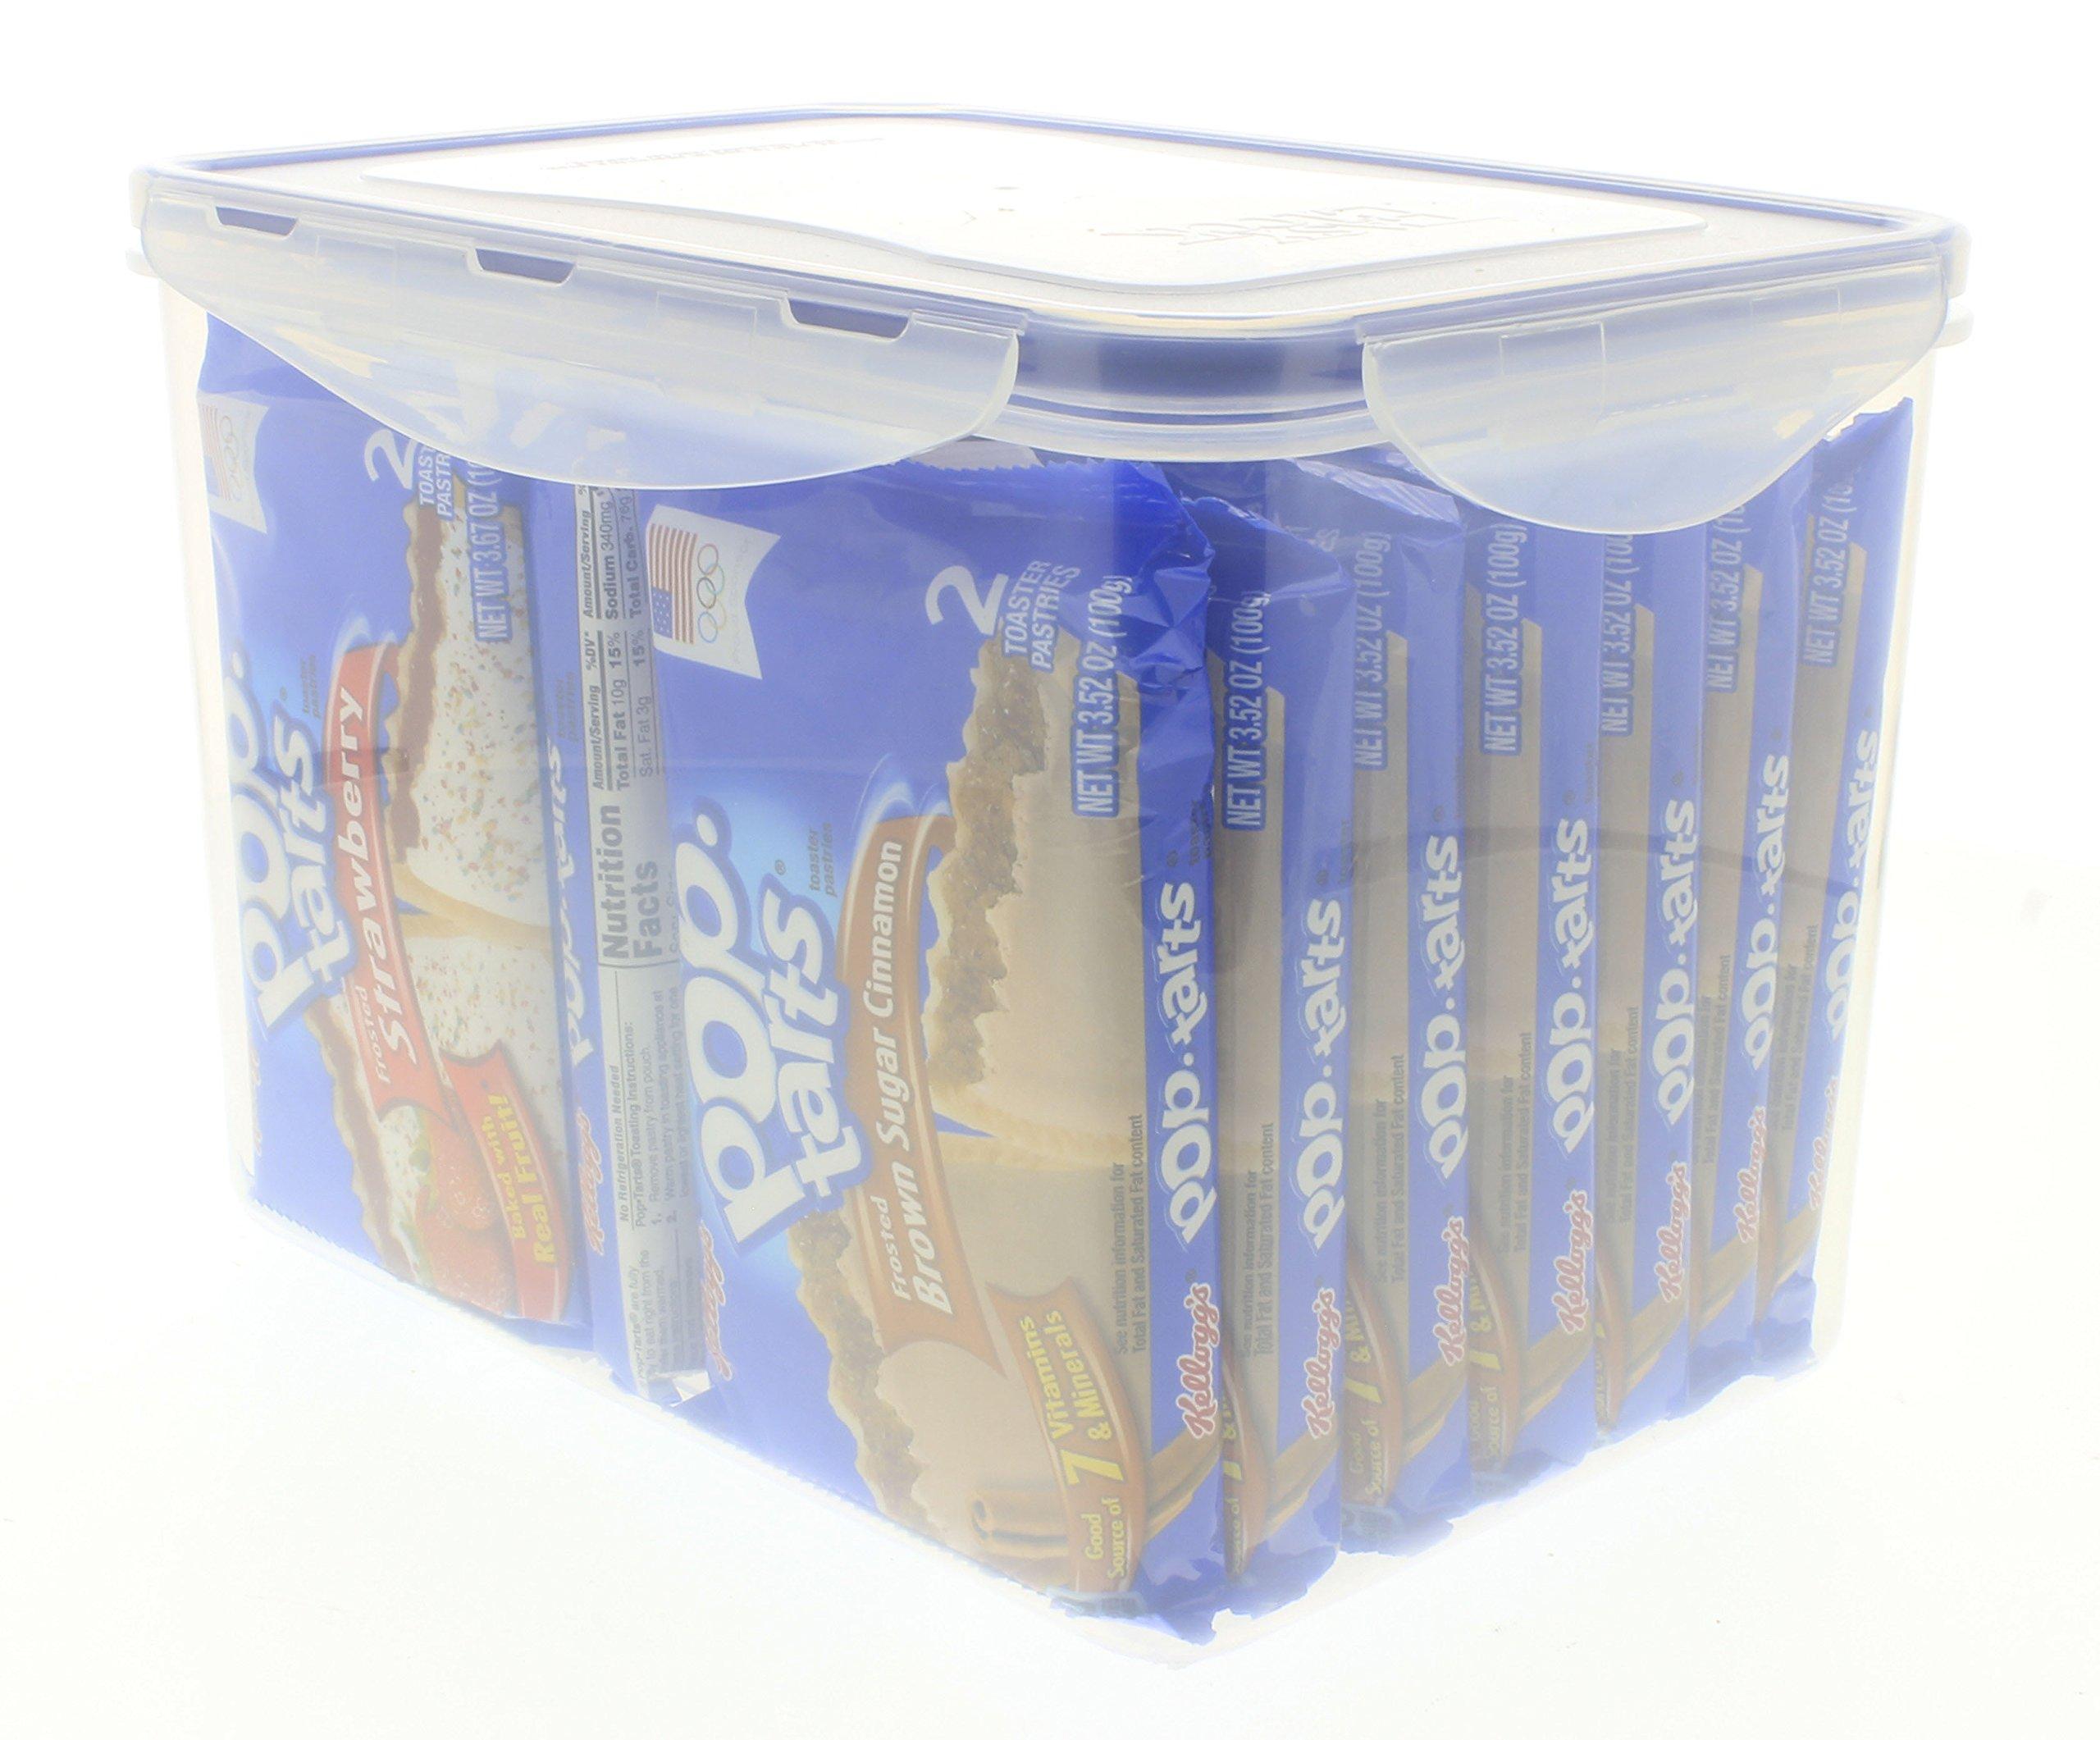 Kellogg's Pop-Tarts 16 pk, 8 Brown Sugar Cinnamon, 8 Strawberry